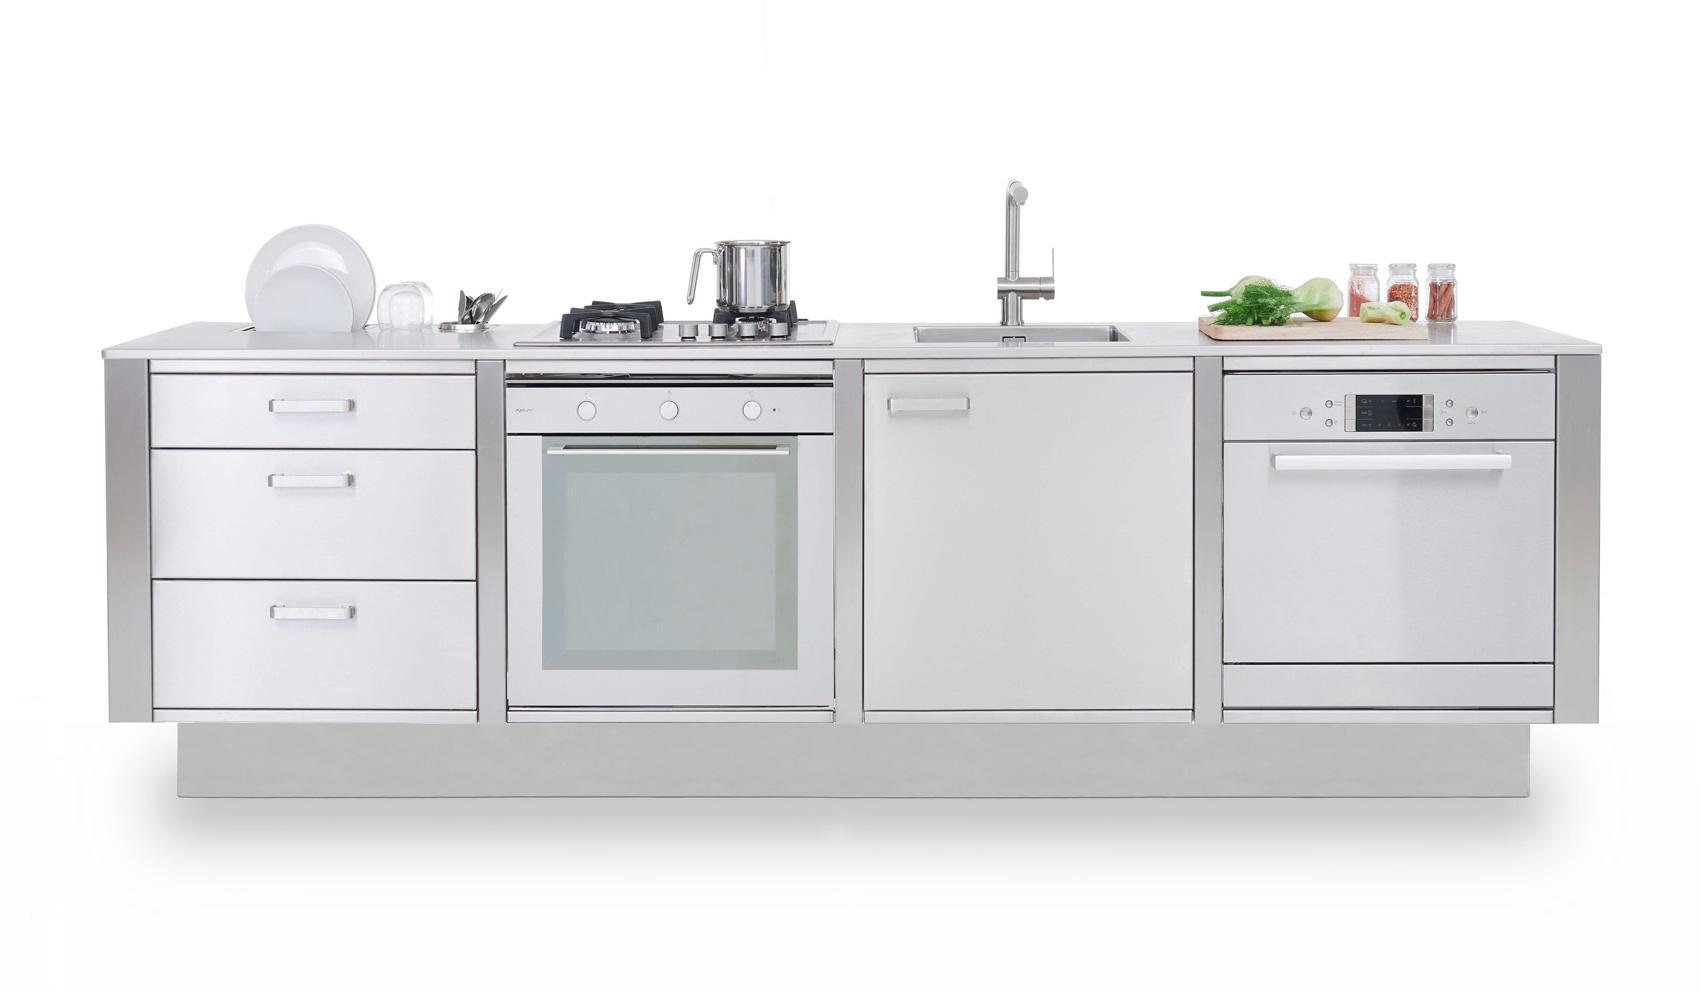 Cucine in Acciaio LOW WINDOW B1 Homemobile